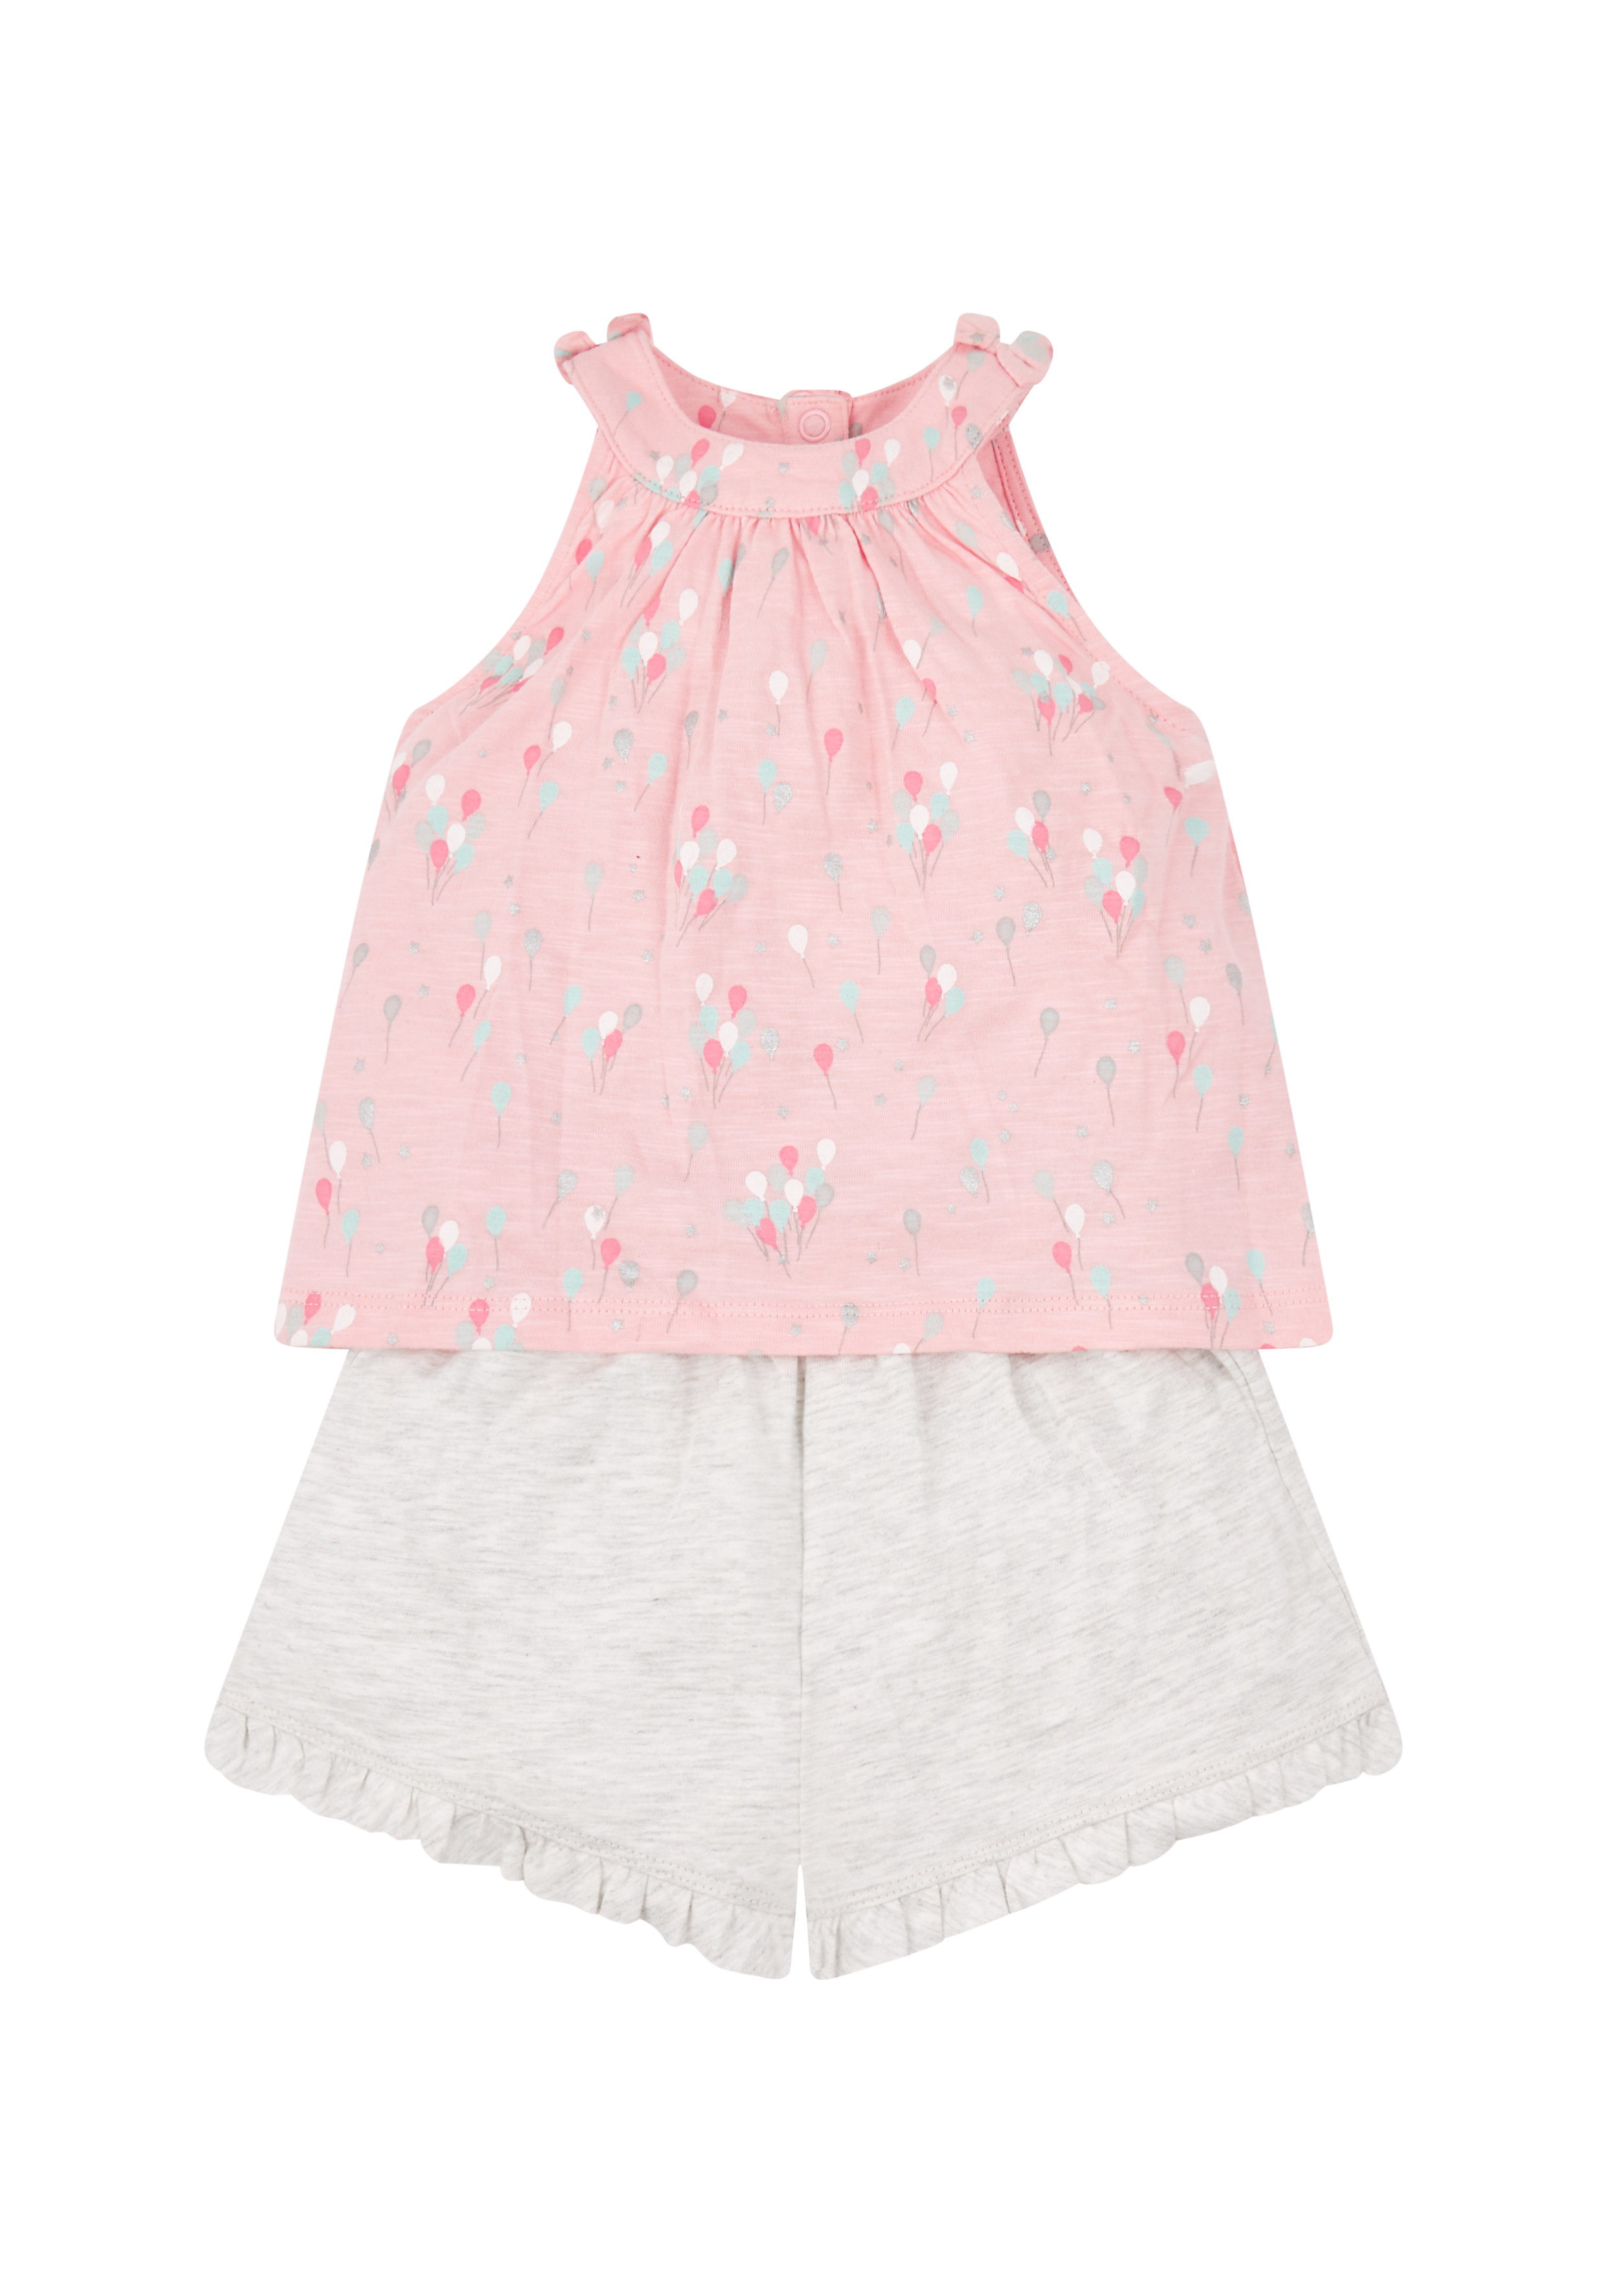 Mothercare   Girls Sleeveless Top And Shorts Set Balloon Print - Pink